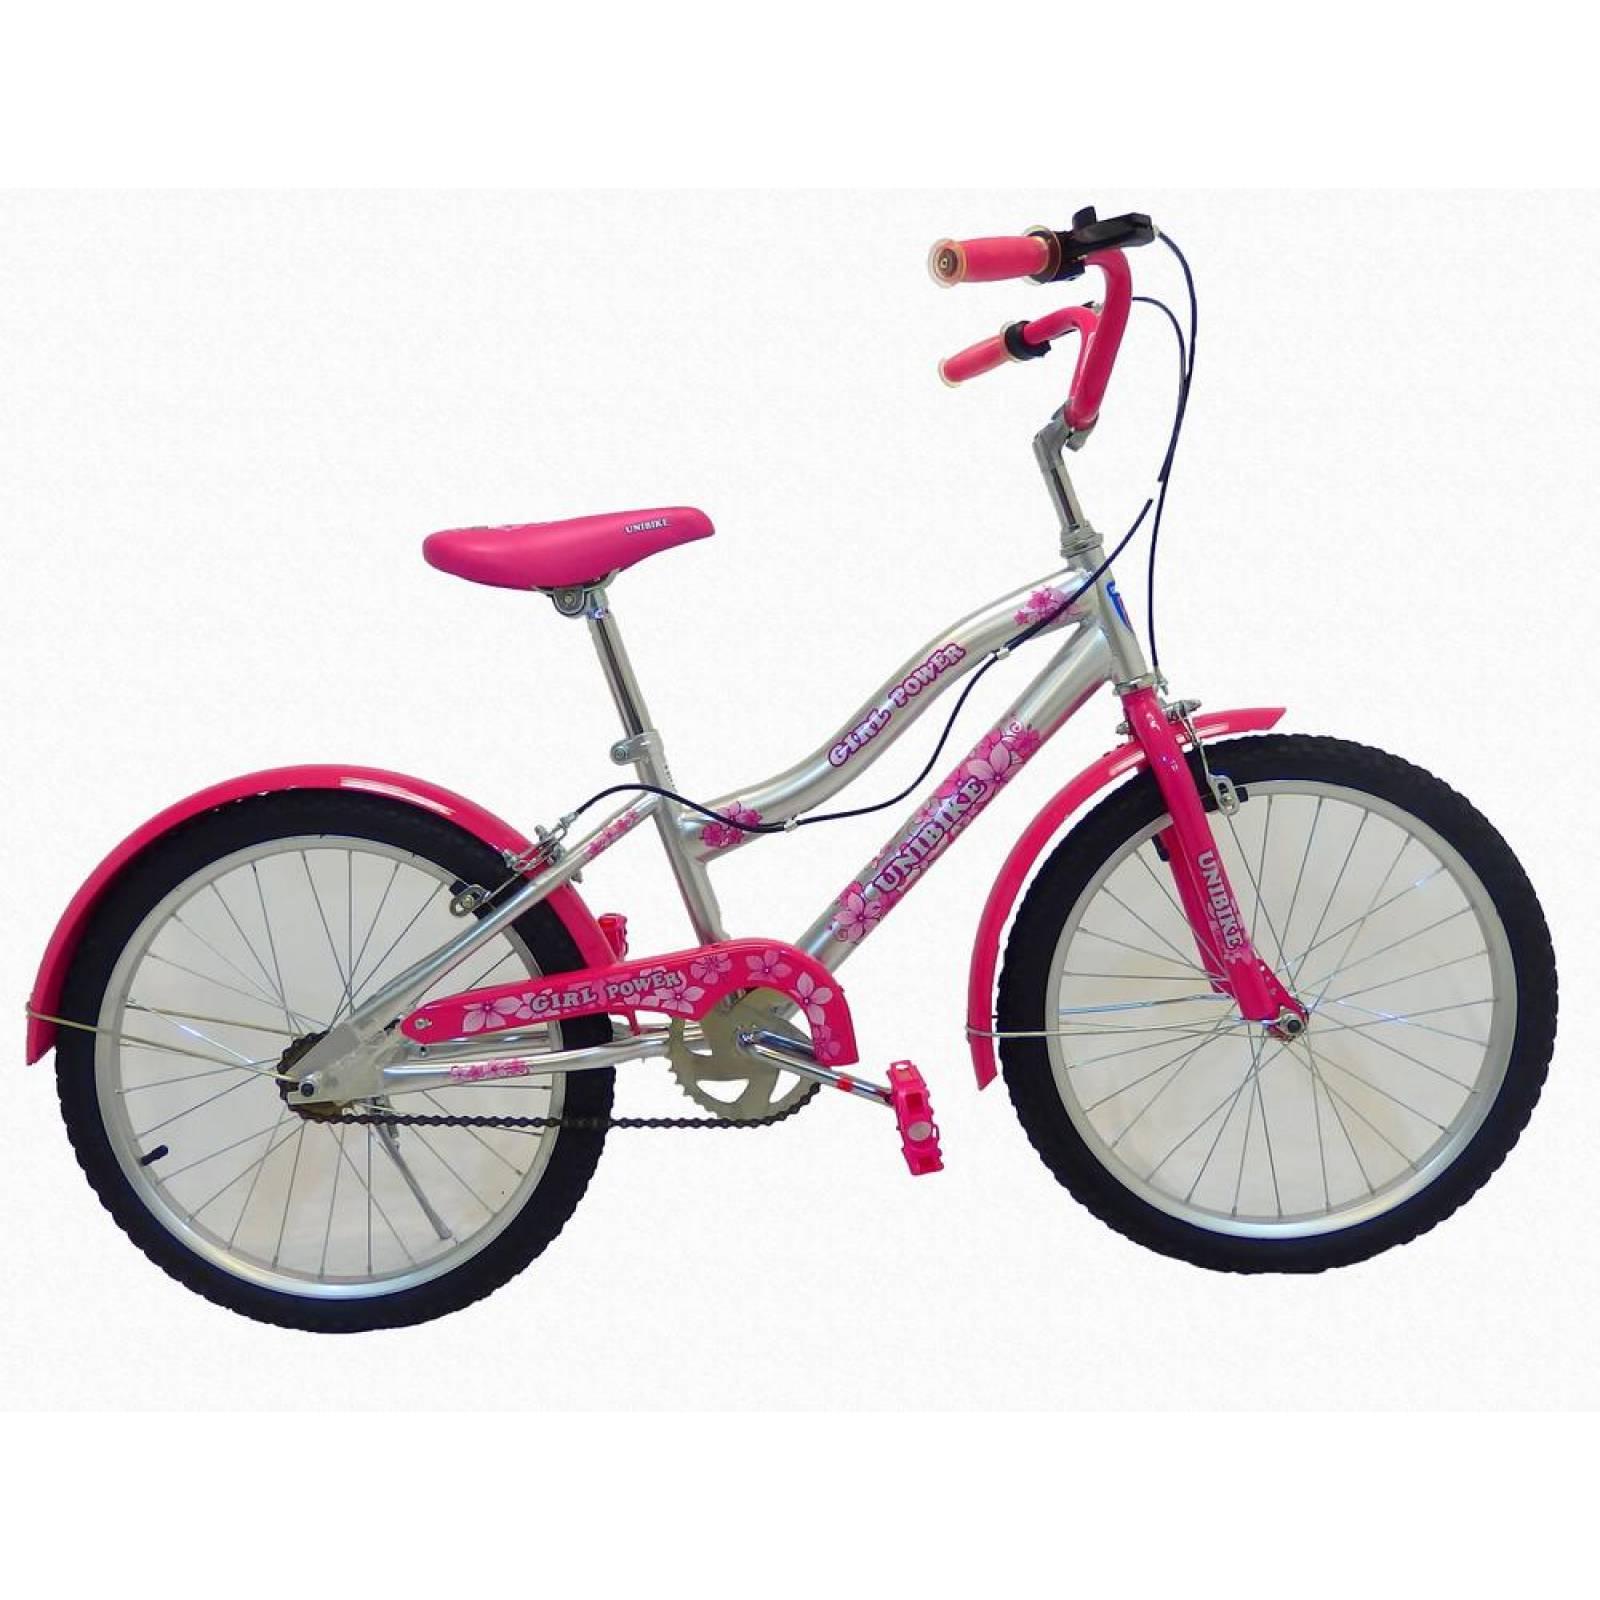 Bicicleta Infantil para niña rodada 20 POWER Blanco